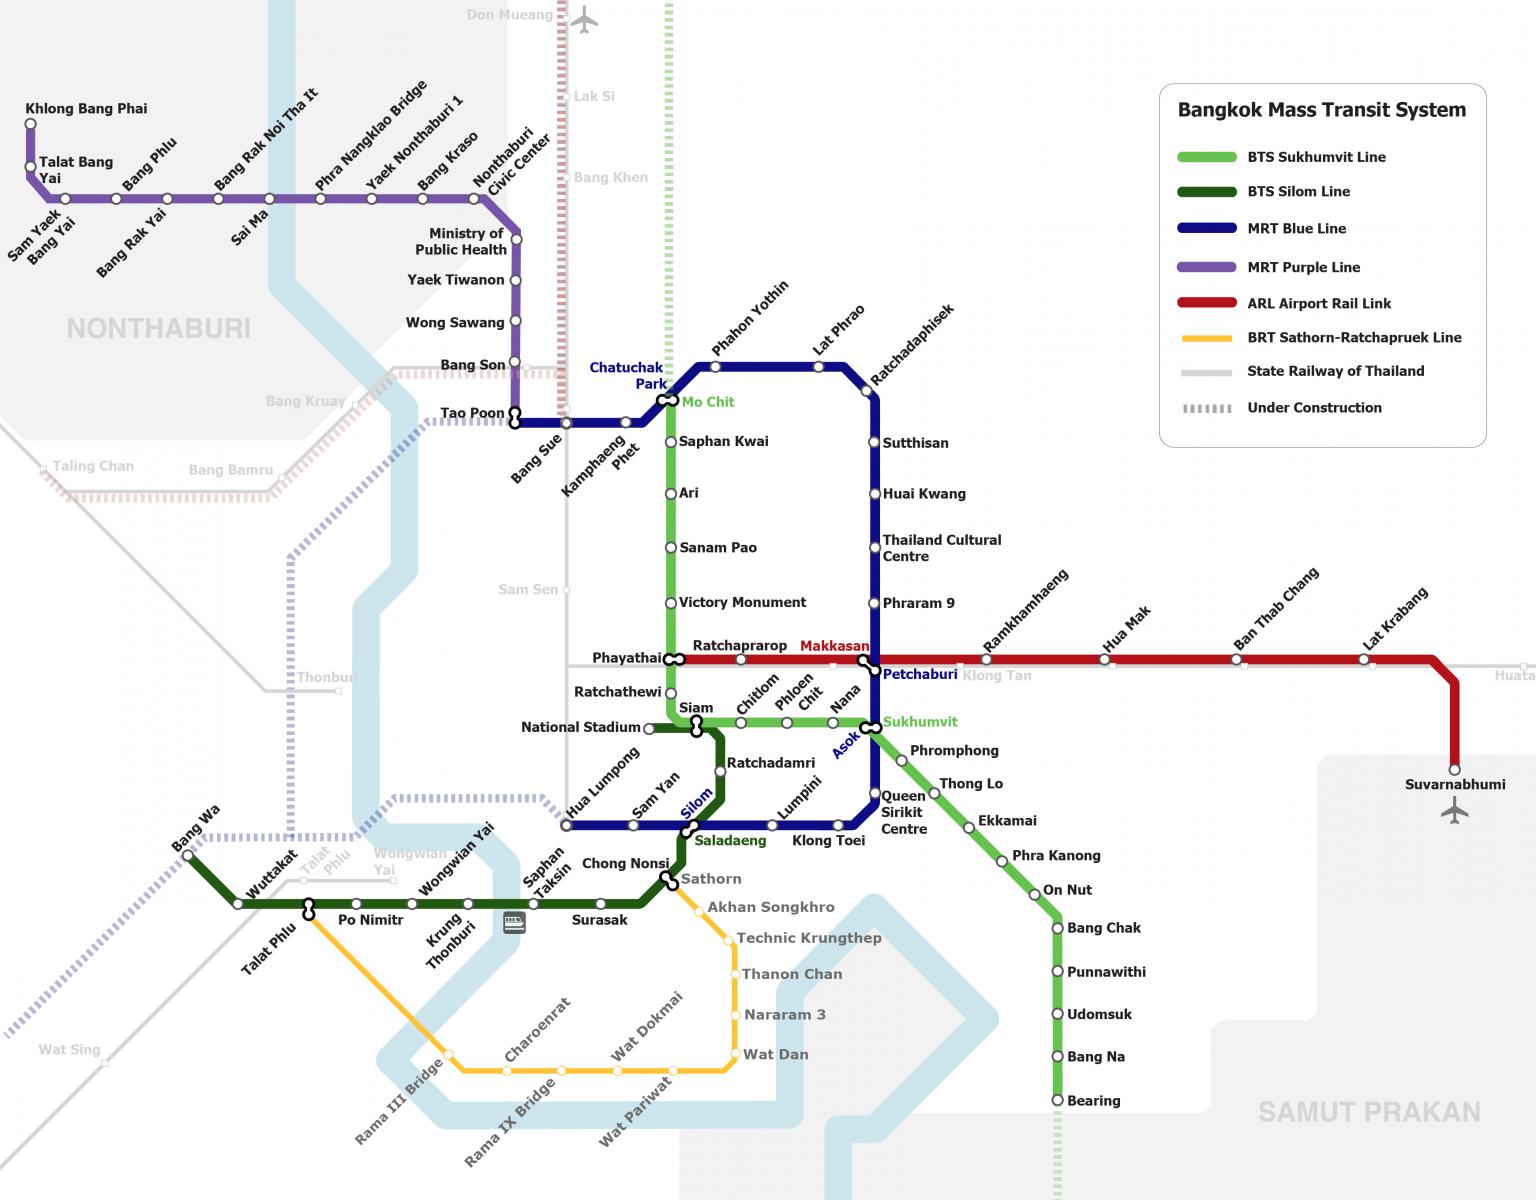 BTS Sky Train, Route kaart Bangkok Silom en Sukhumvit lijn